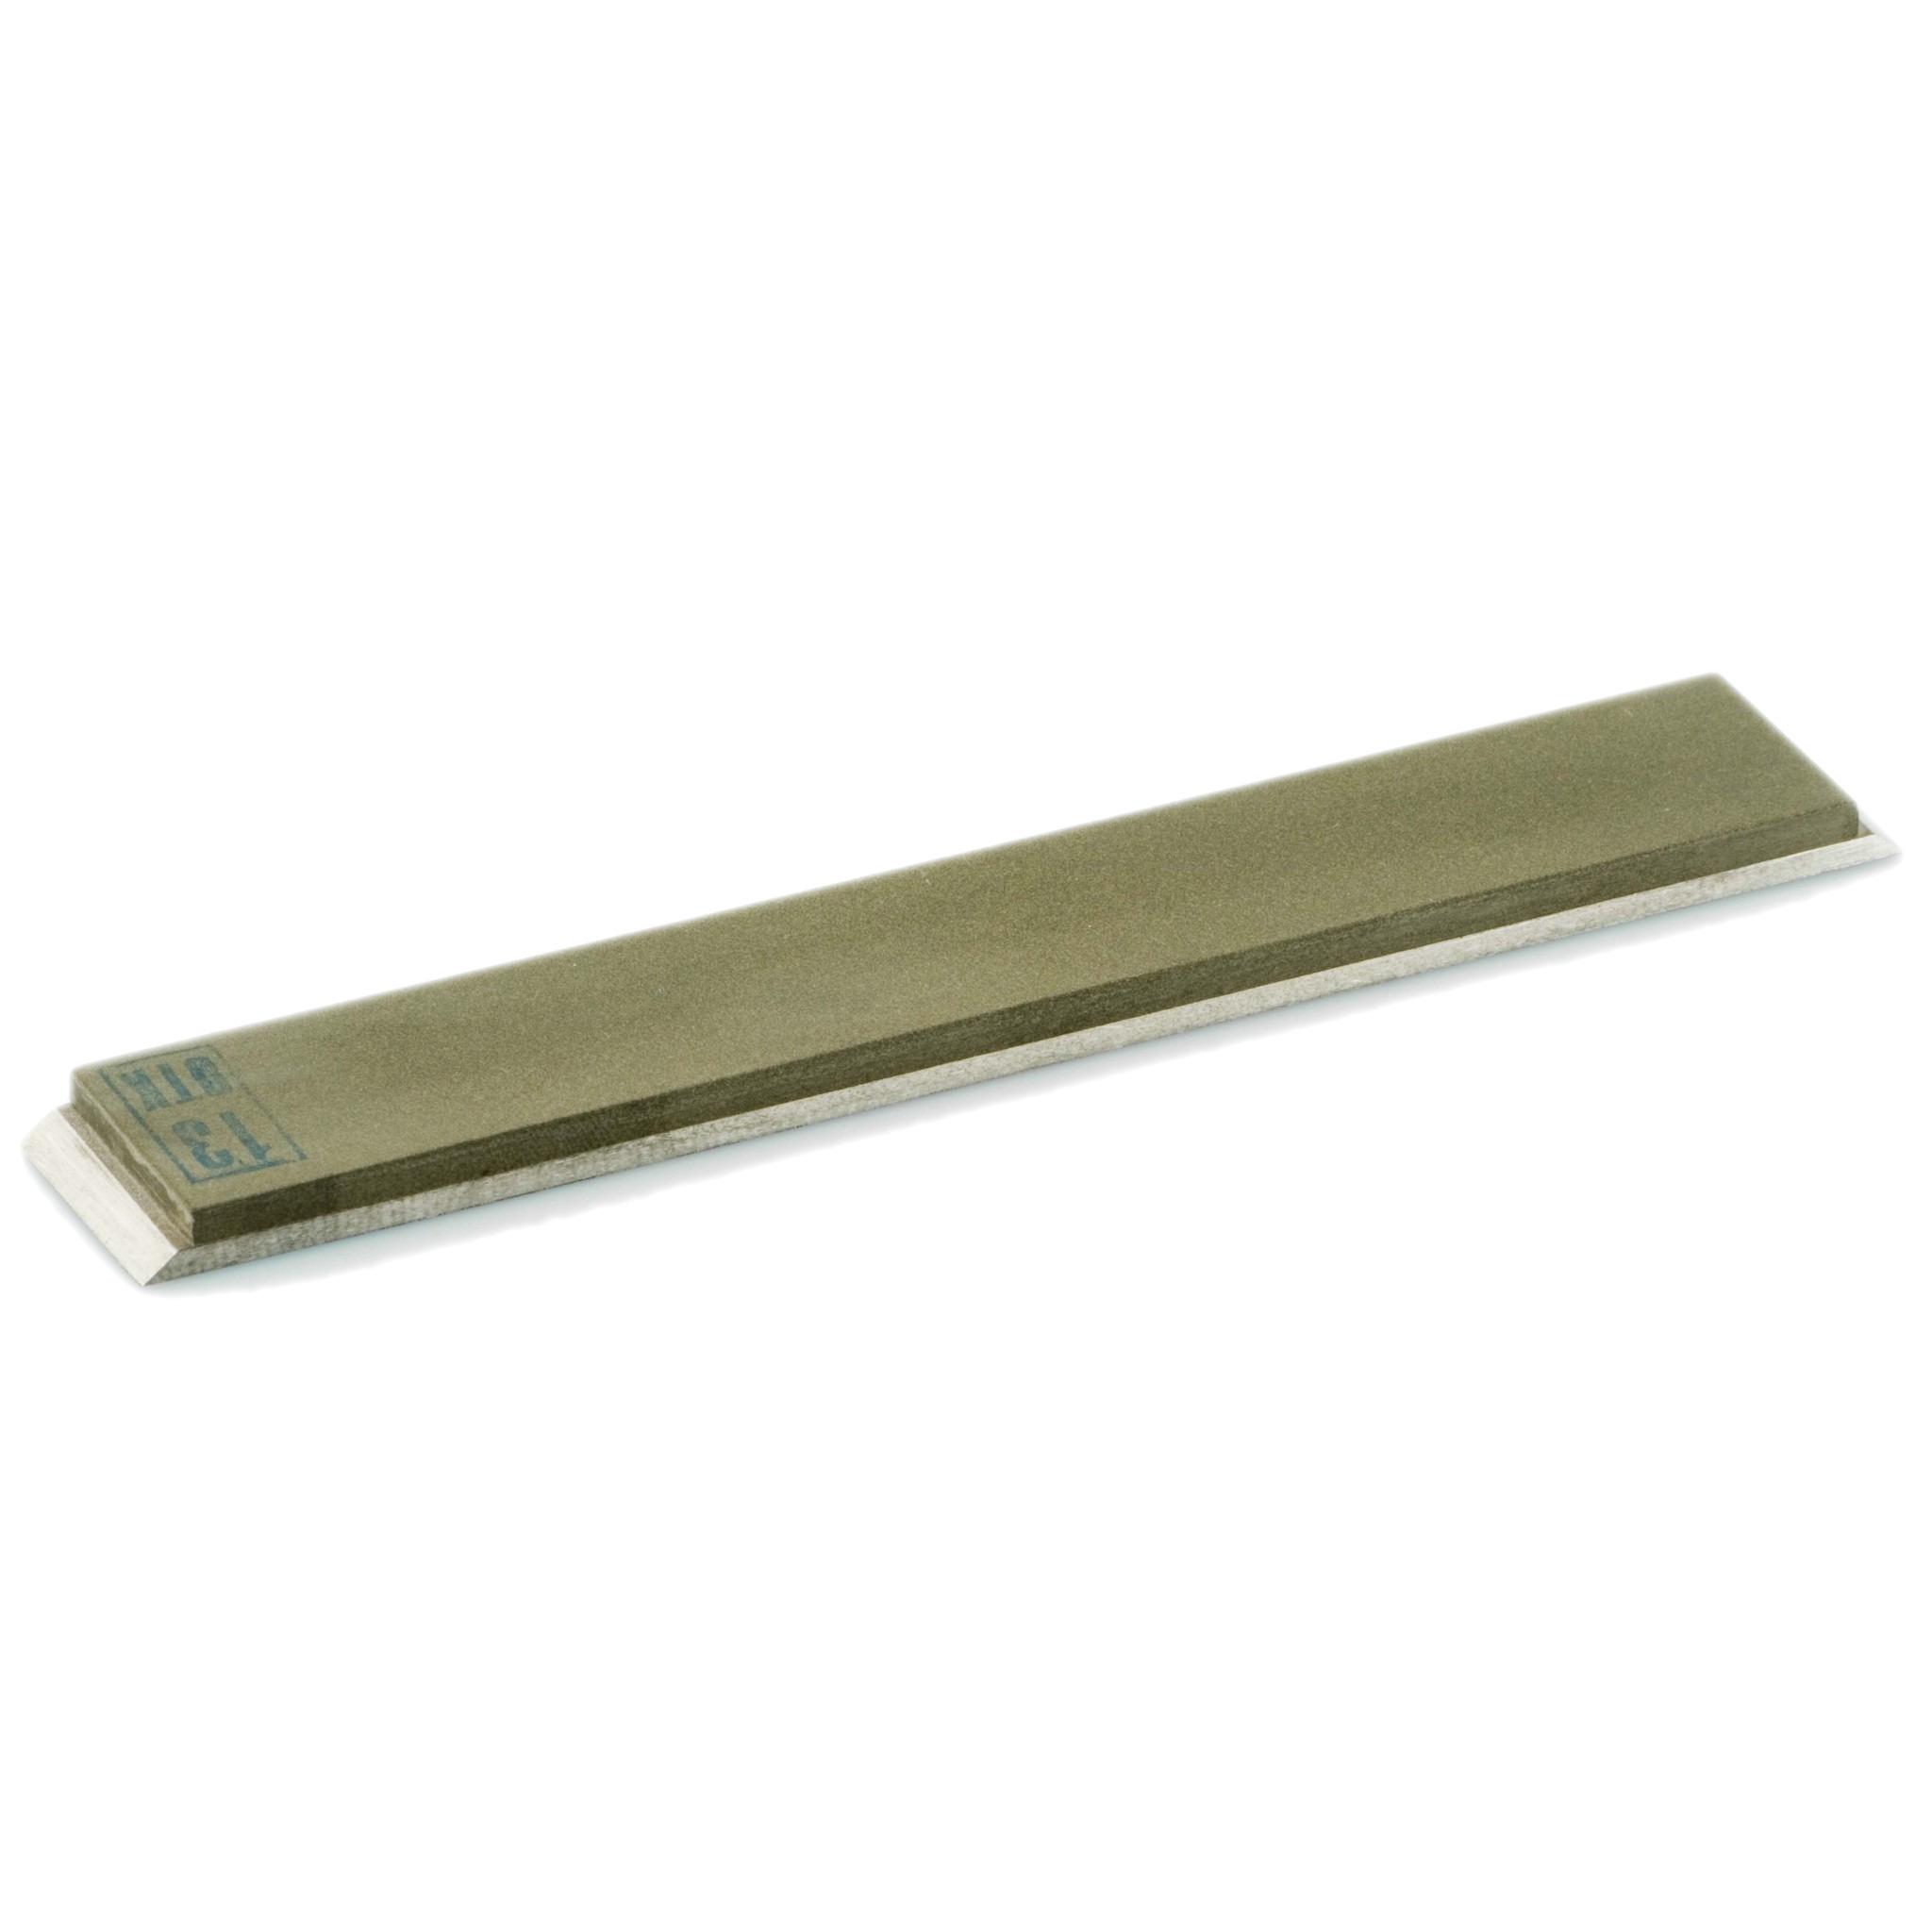 150х25х6 мм для Apex Edge Pro, ЖУК Алмазный брусок 150х25х6 50/40 100% Белый.jpg